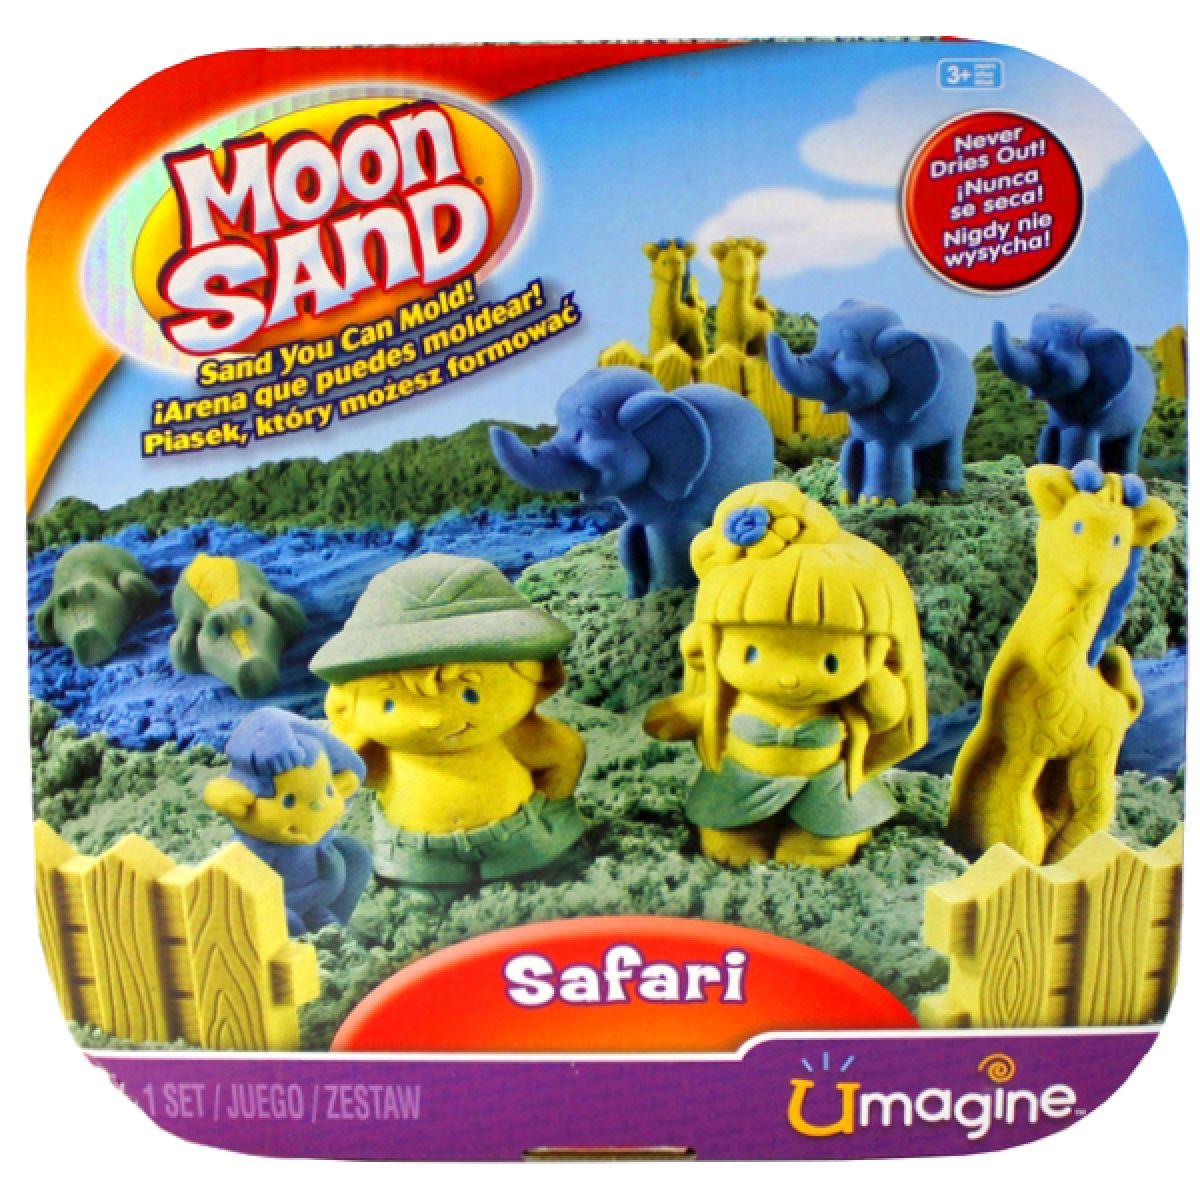 Moon Sand Safari